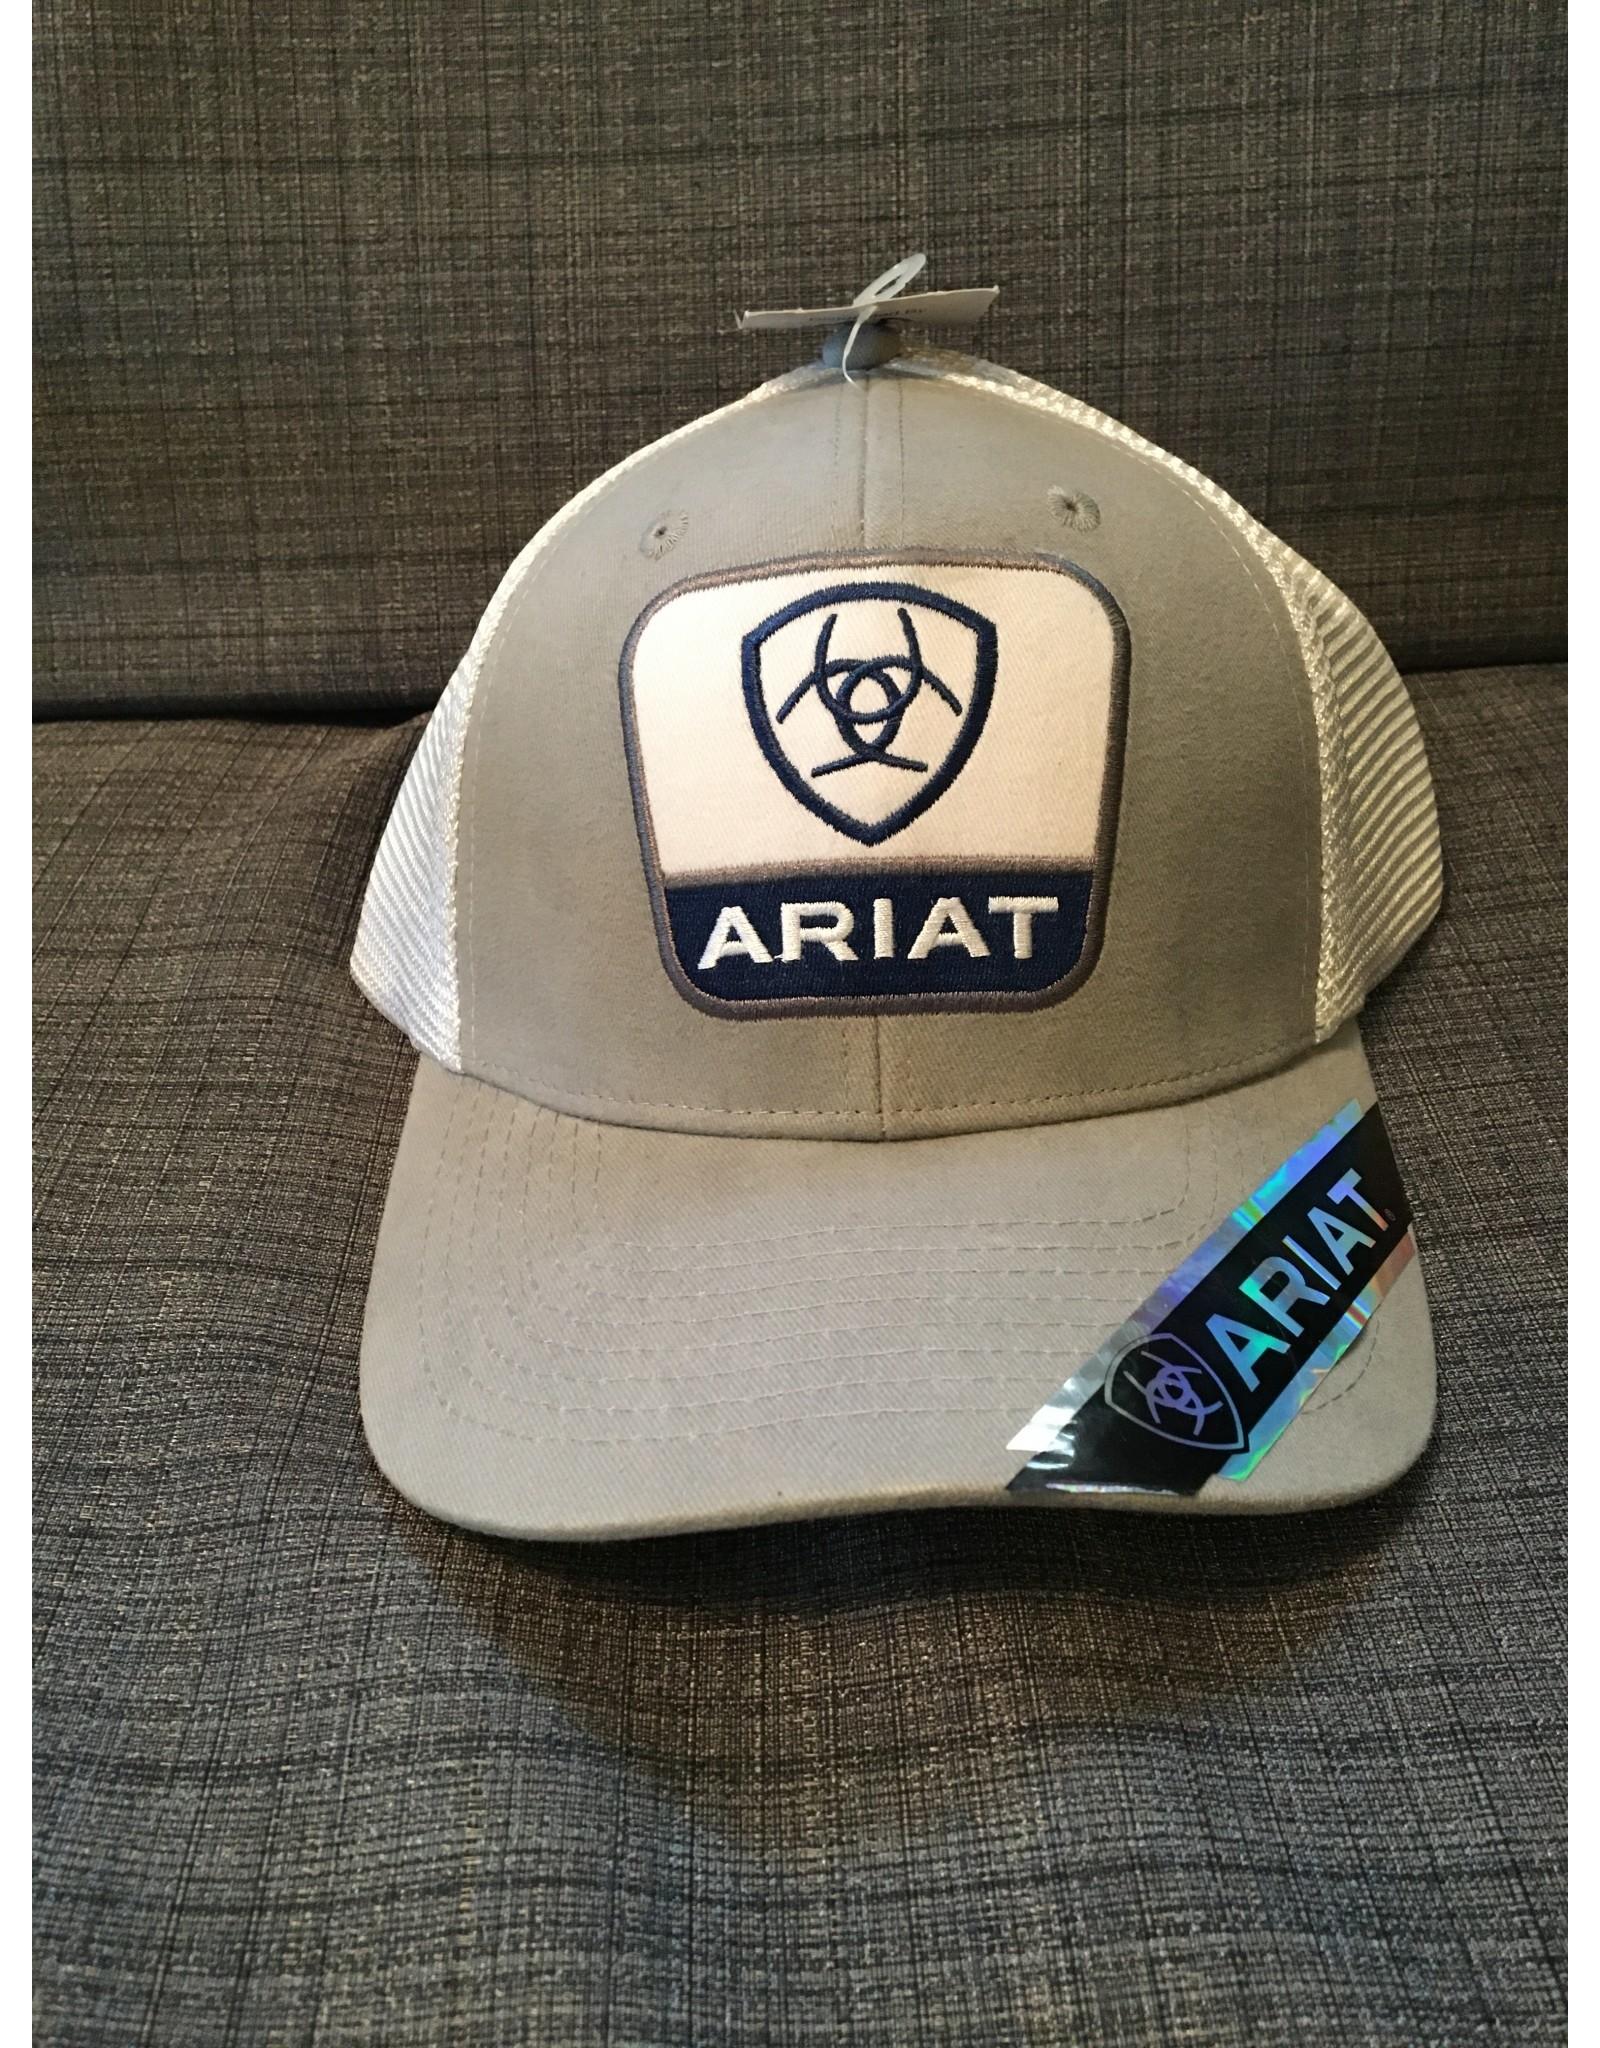 ARIAT LOGO GREY MEN'S BALL CAP